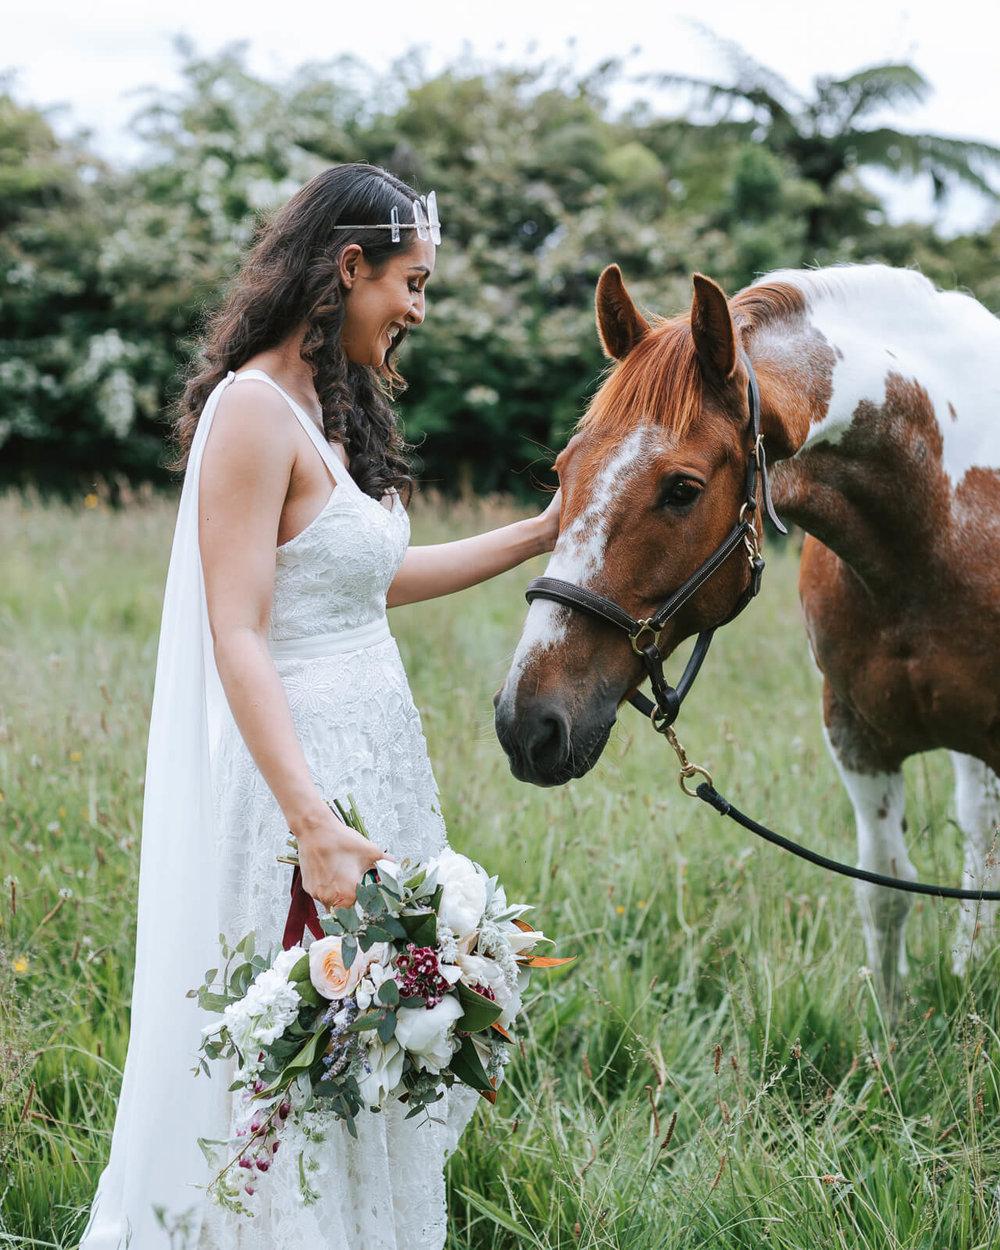 elizabeth may bridal DSC_1529_EmmaSkye.jpg